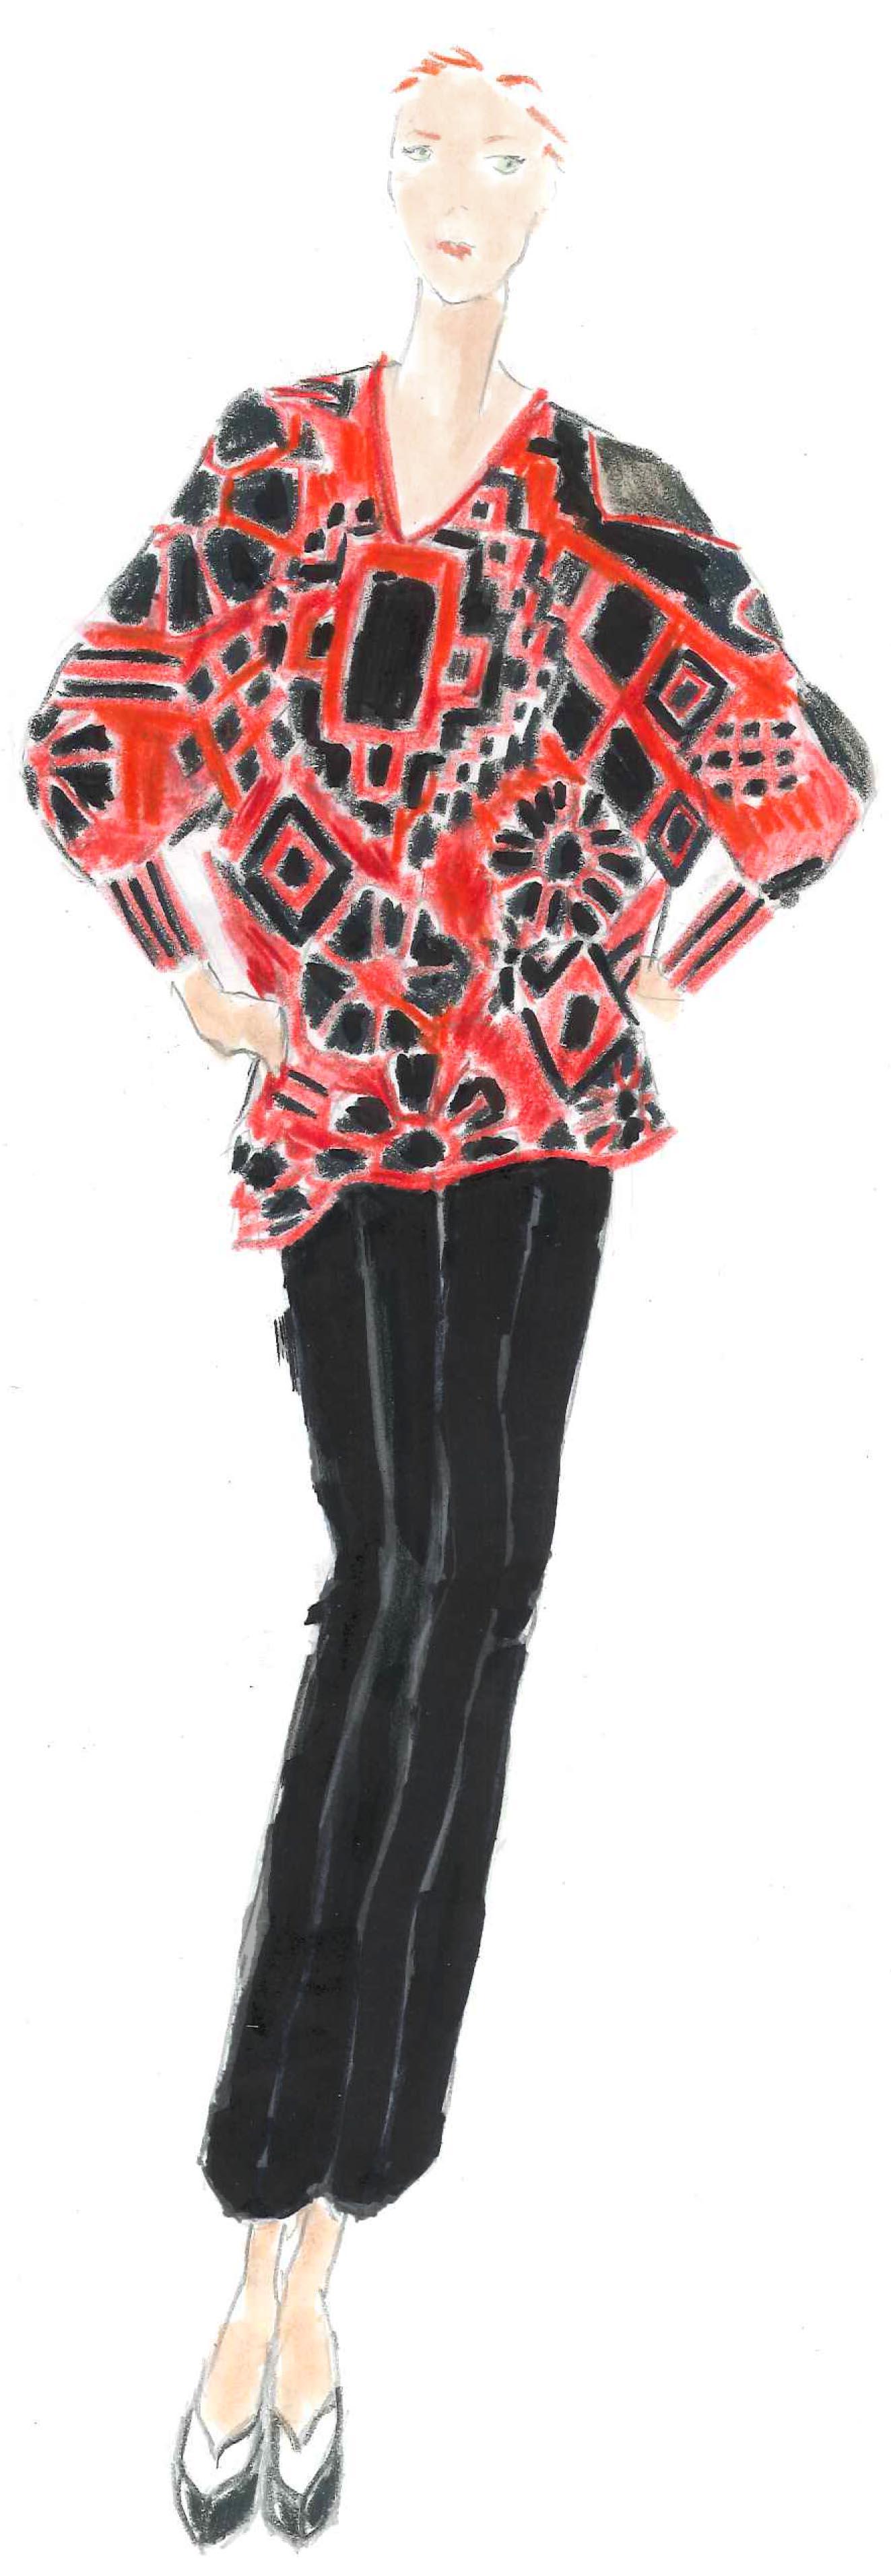 red_black_Sweater.jpg